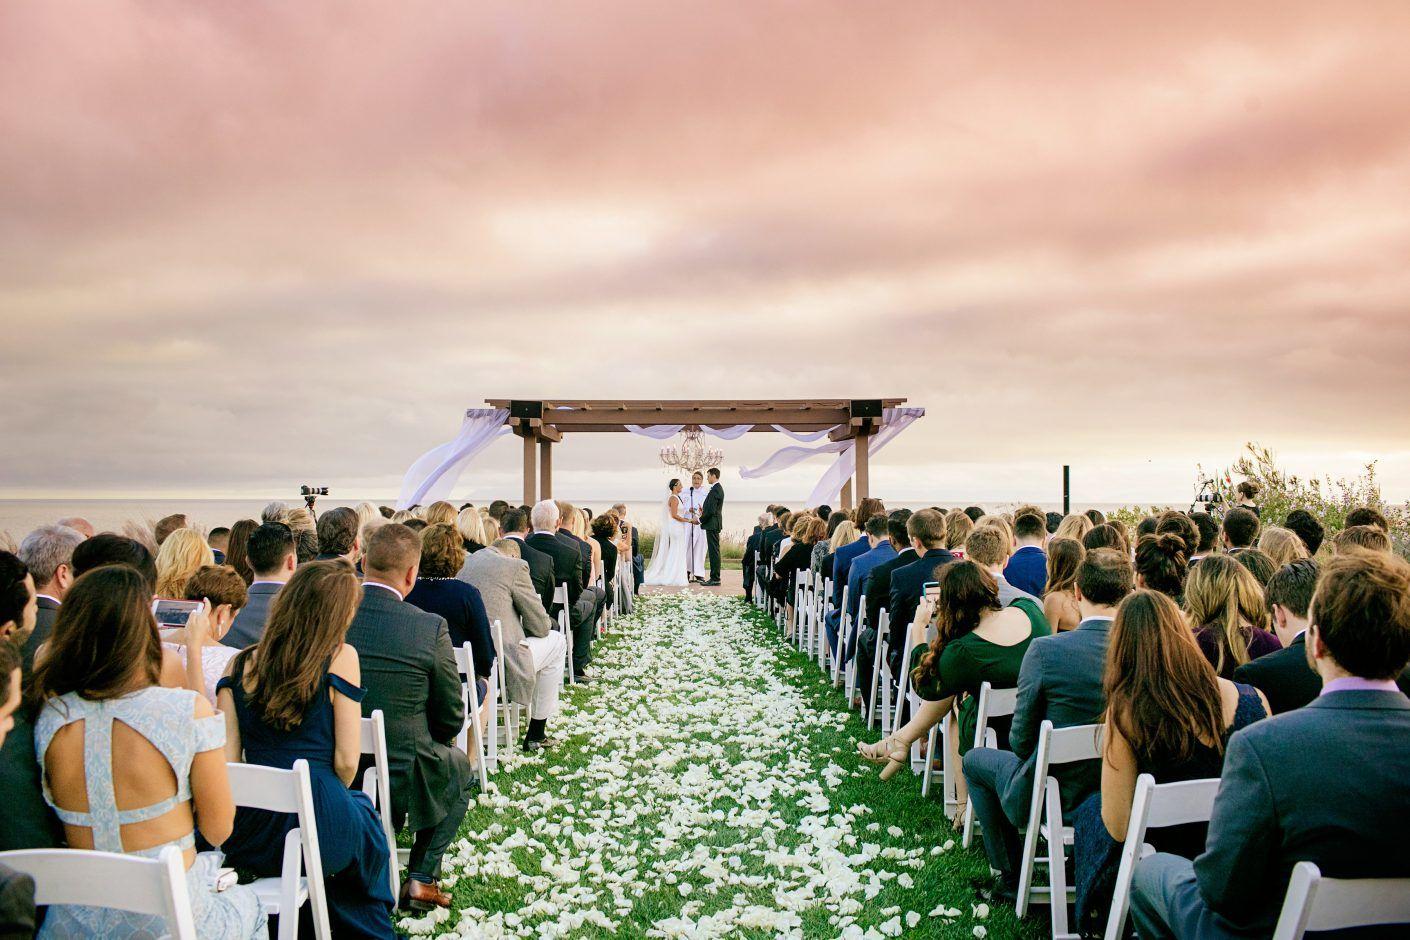 AN INTERTWINED EVENT MODERN MILLENNIAL WEDDING (With